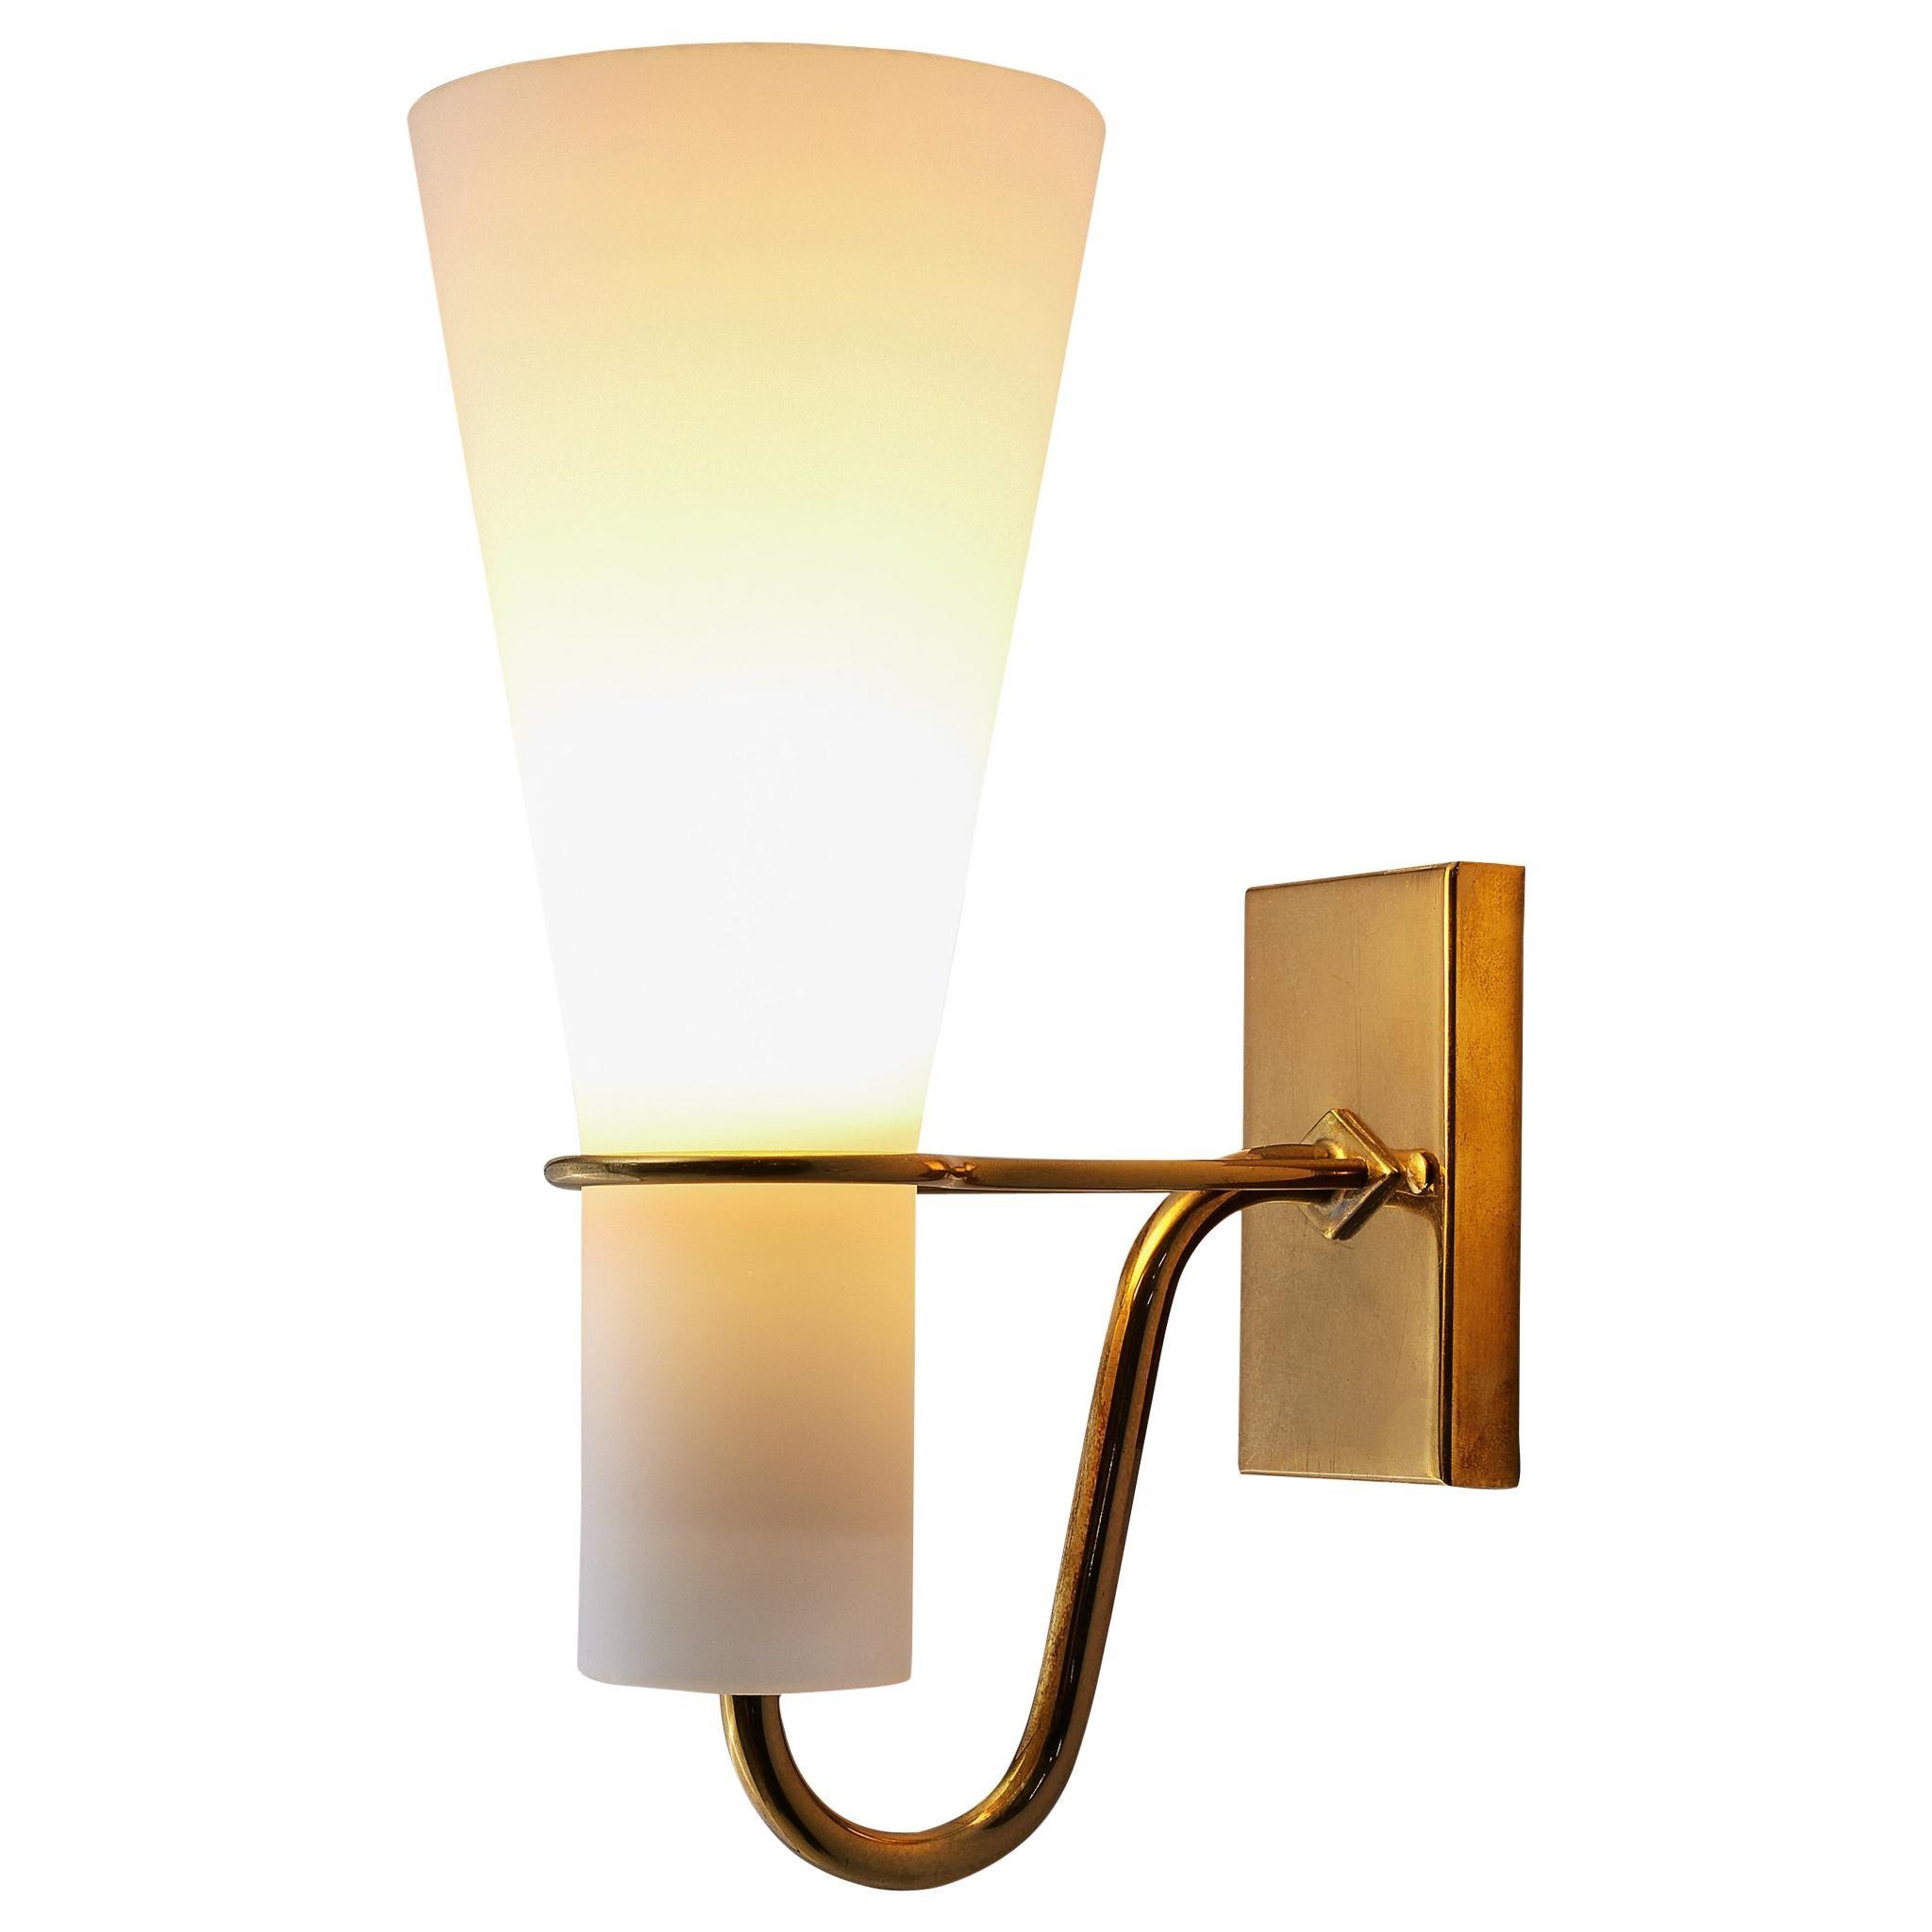 Hans Bergström Wall Light for ASEA Belysning with Brass